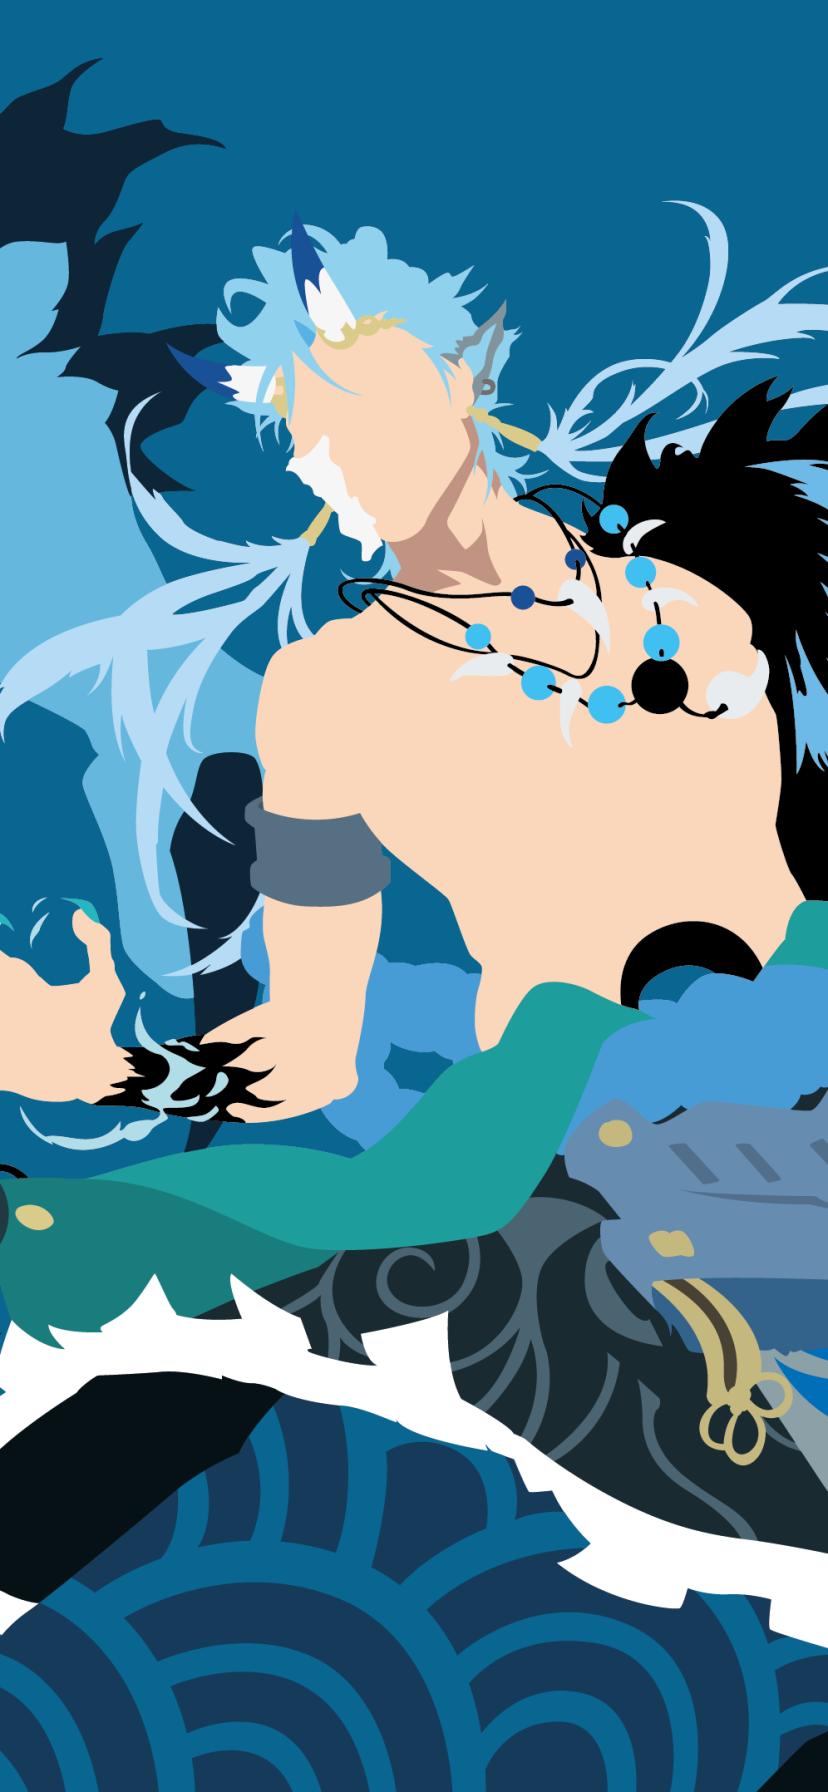 Download Wallpaper Anime / Bleach (828x1792) Mobile Wallpaper